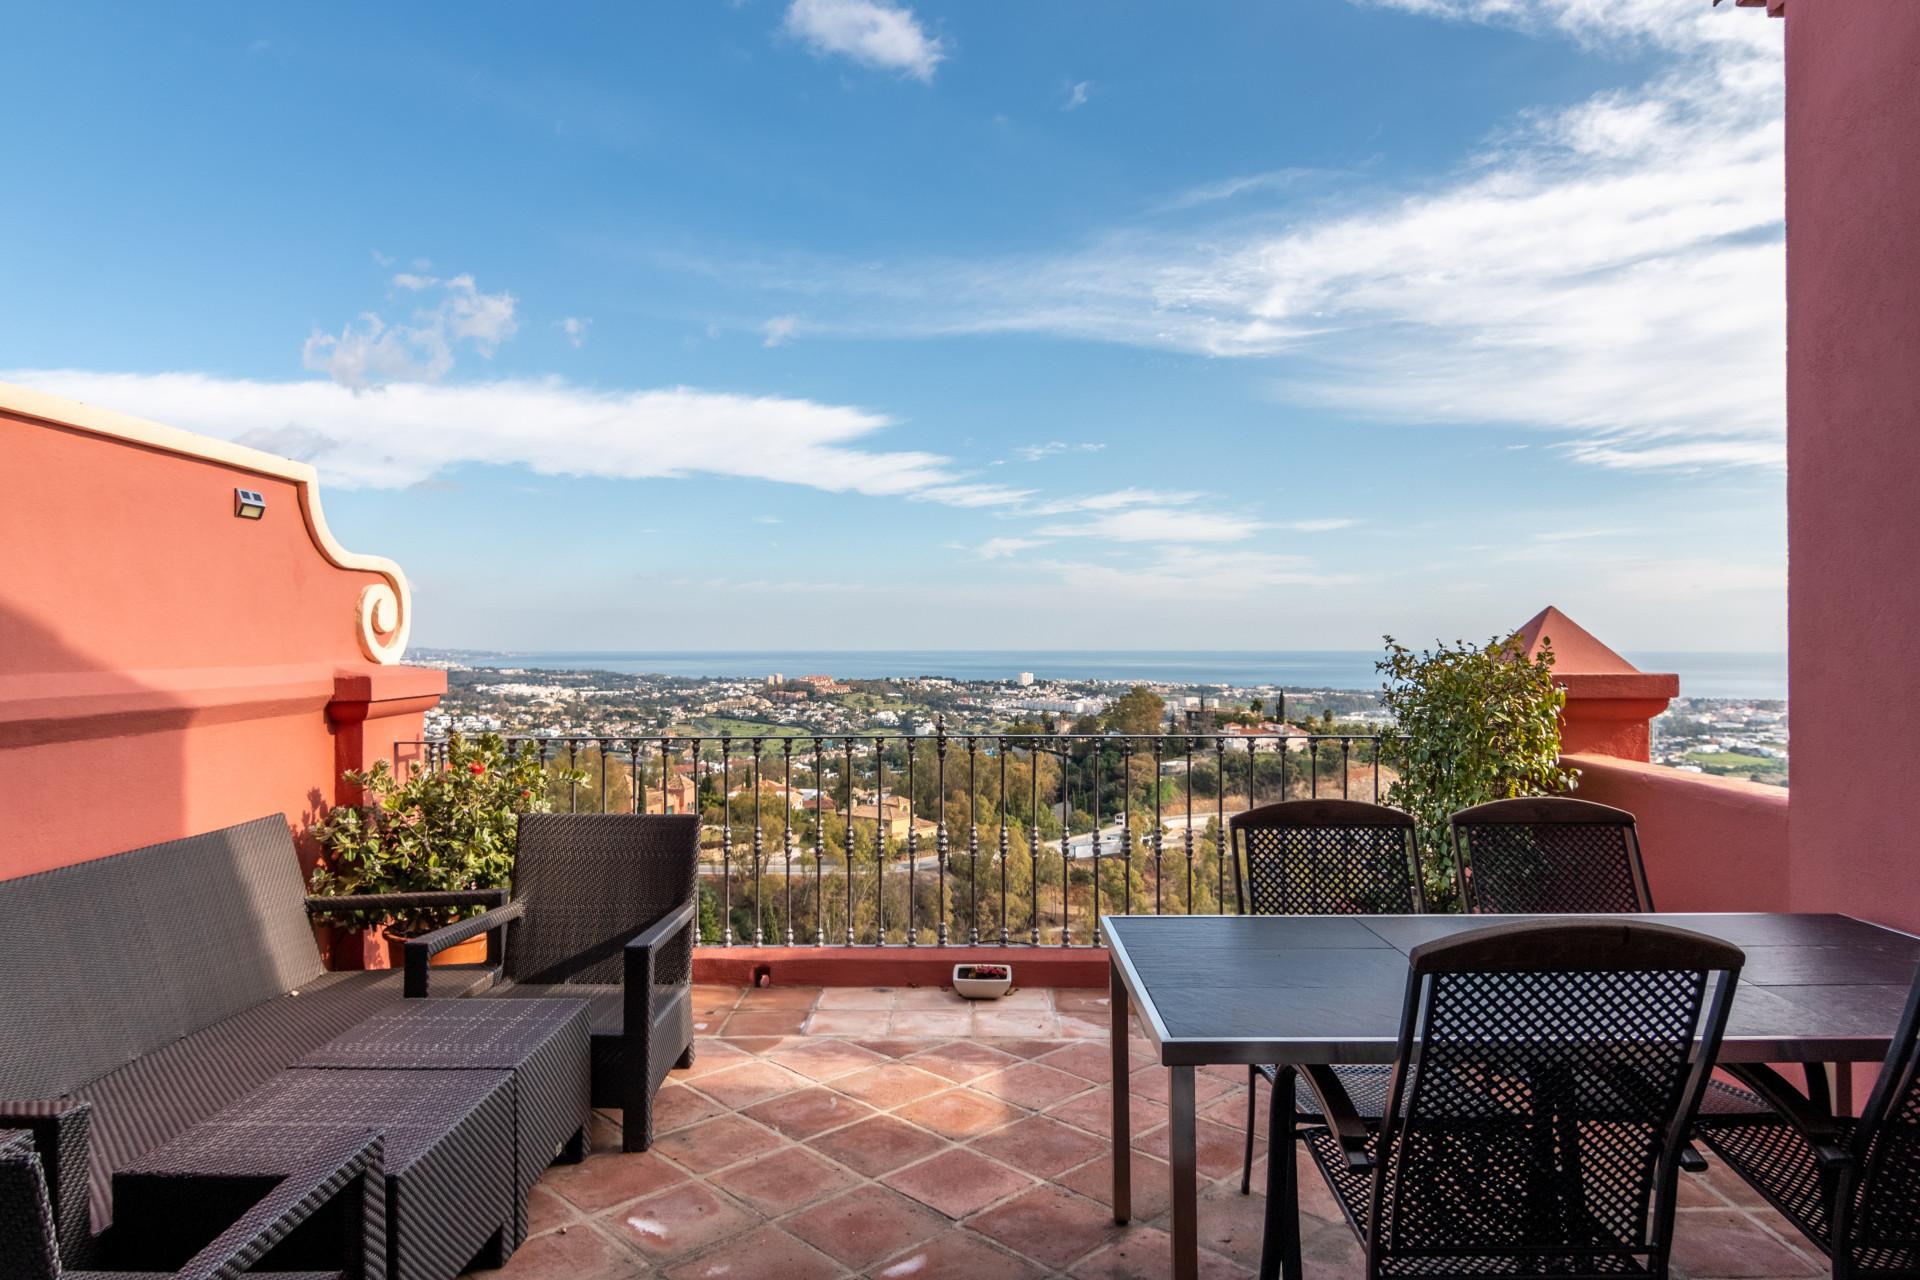 Immaculate duplex penthouse for sale in Torre Halcones - Benahavis – Marbella